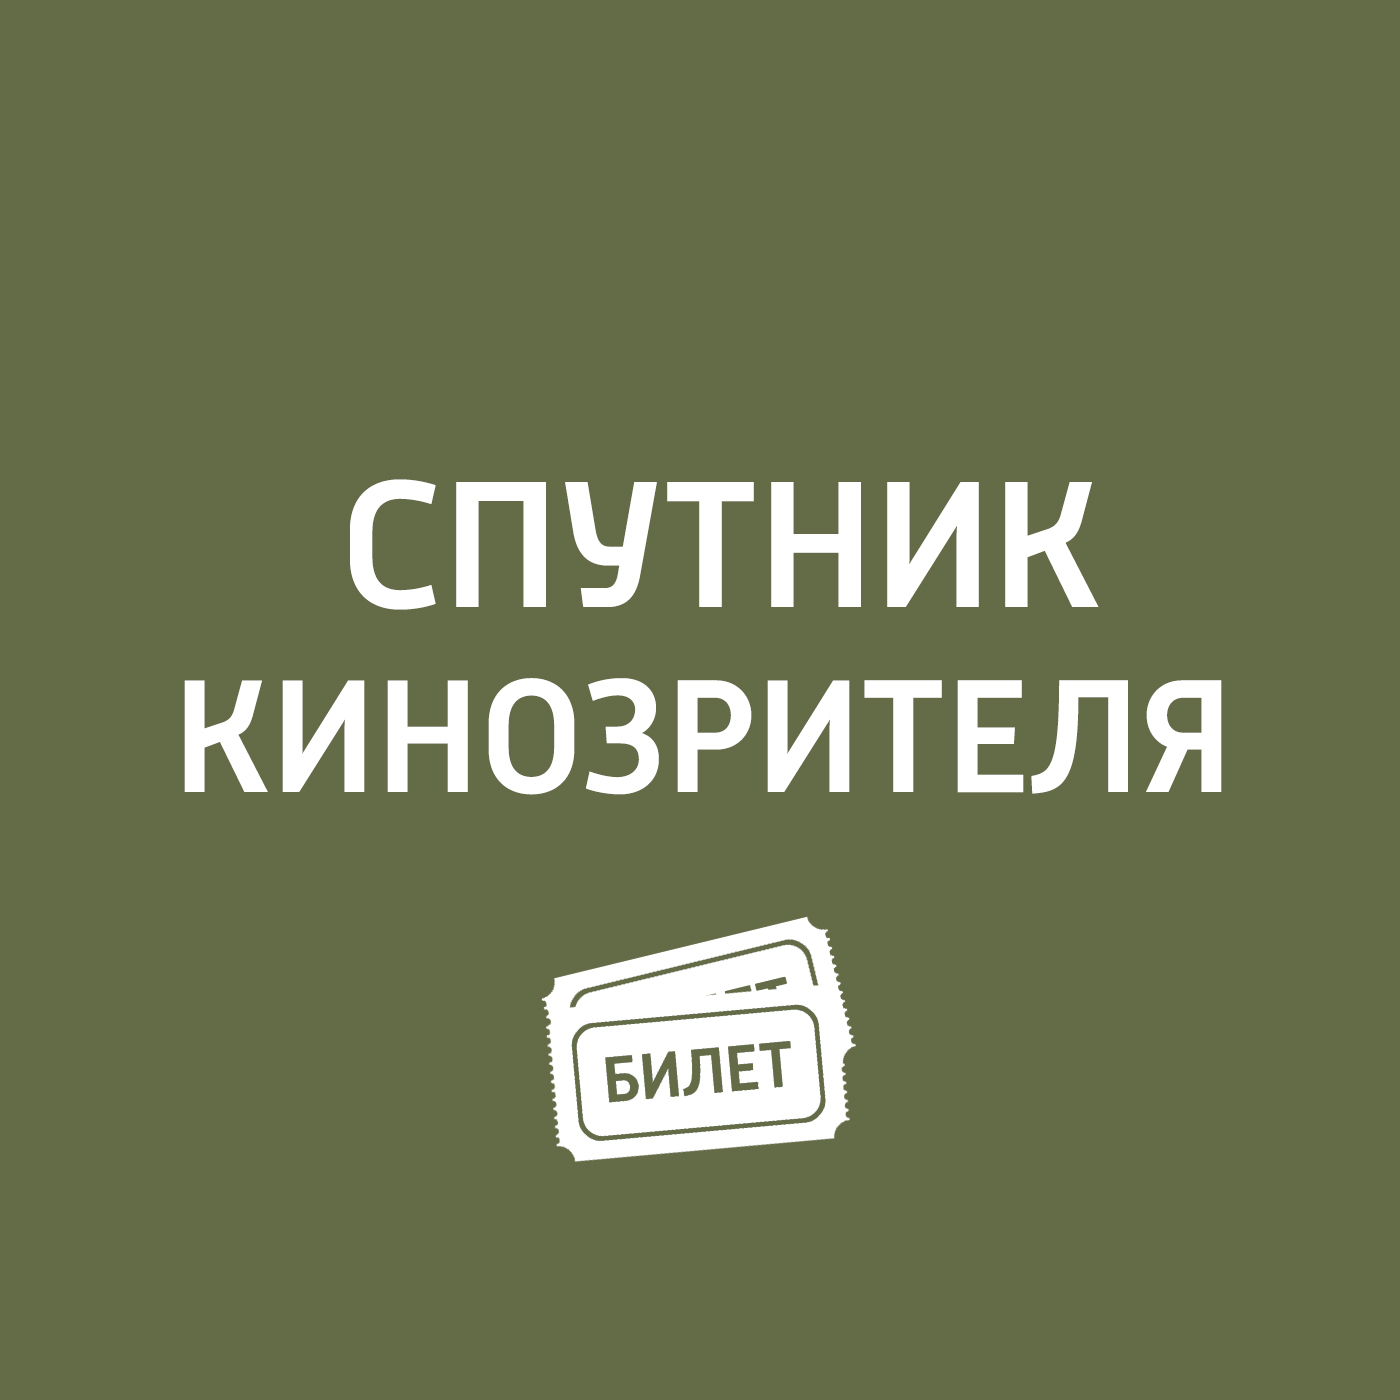 Антон Долин Отчет о 68 каннском кинофестивале антон долин сансет бульвар